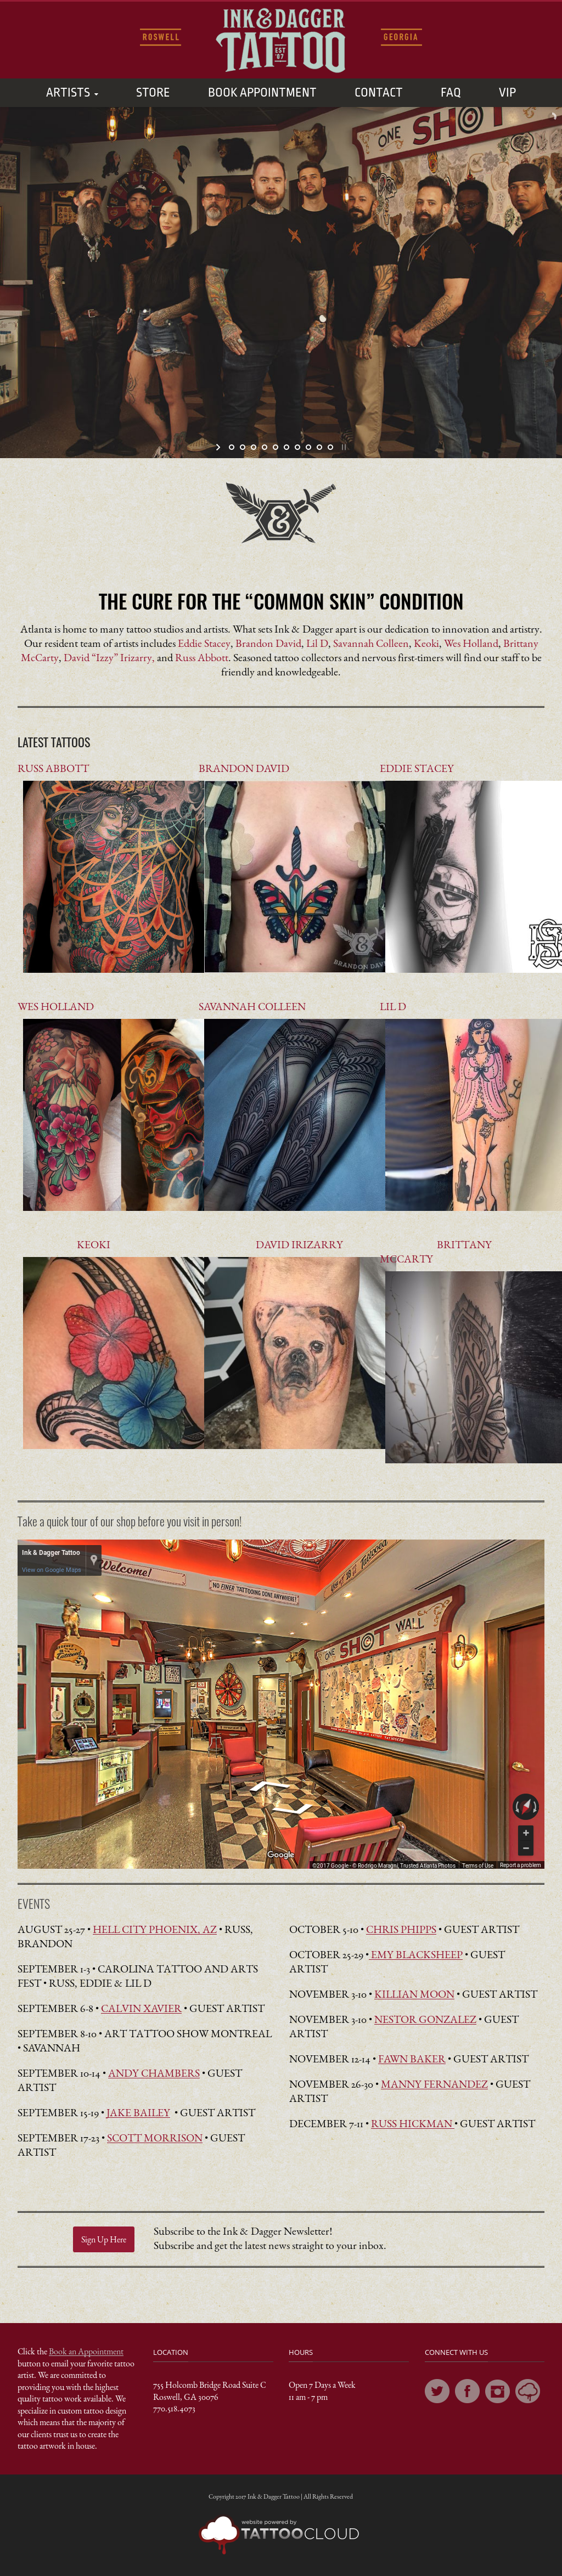 a8e7d8539 Ink & Dagger Tattoo Studio Competitors, Revenue and Employees - Owler  Company Profile